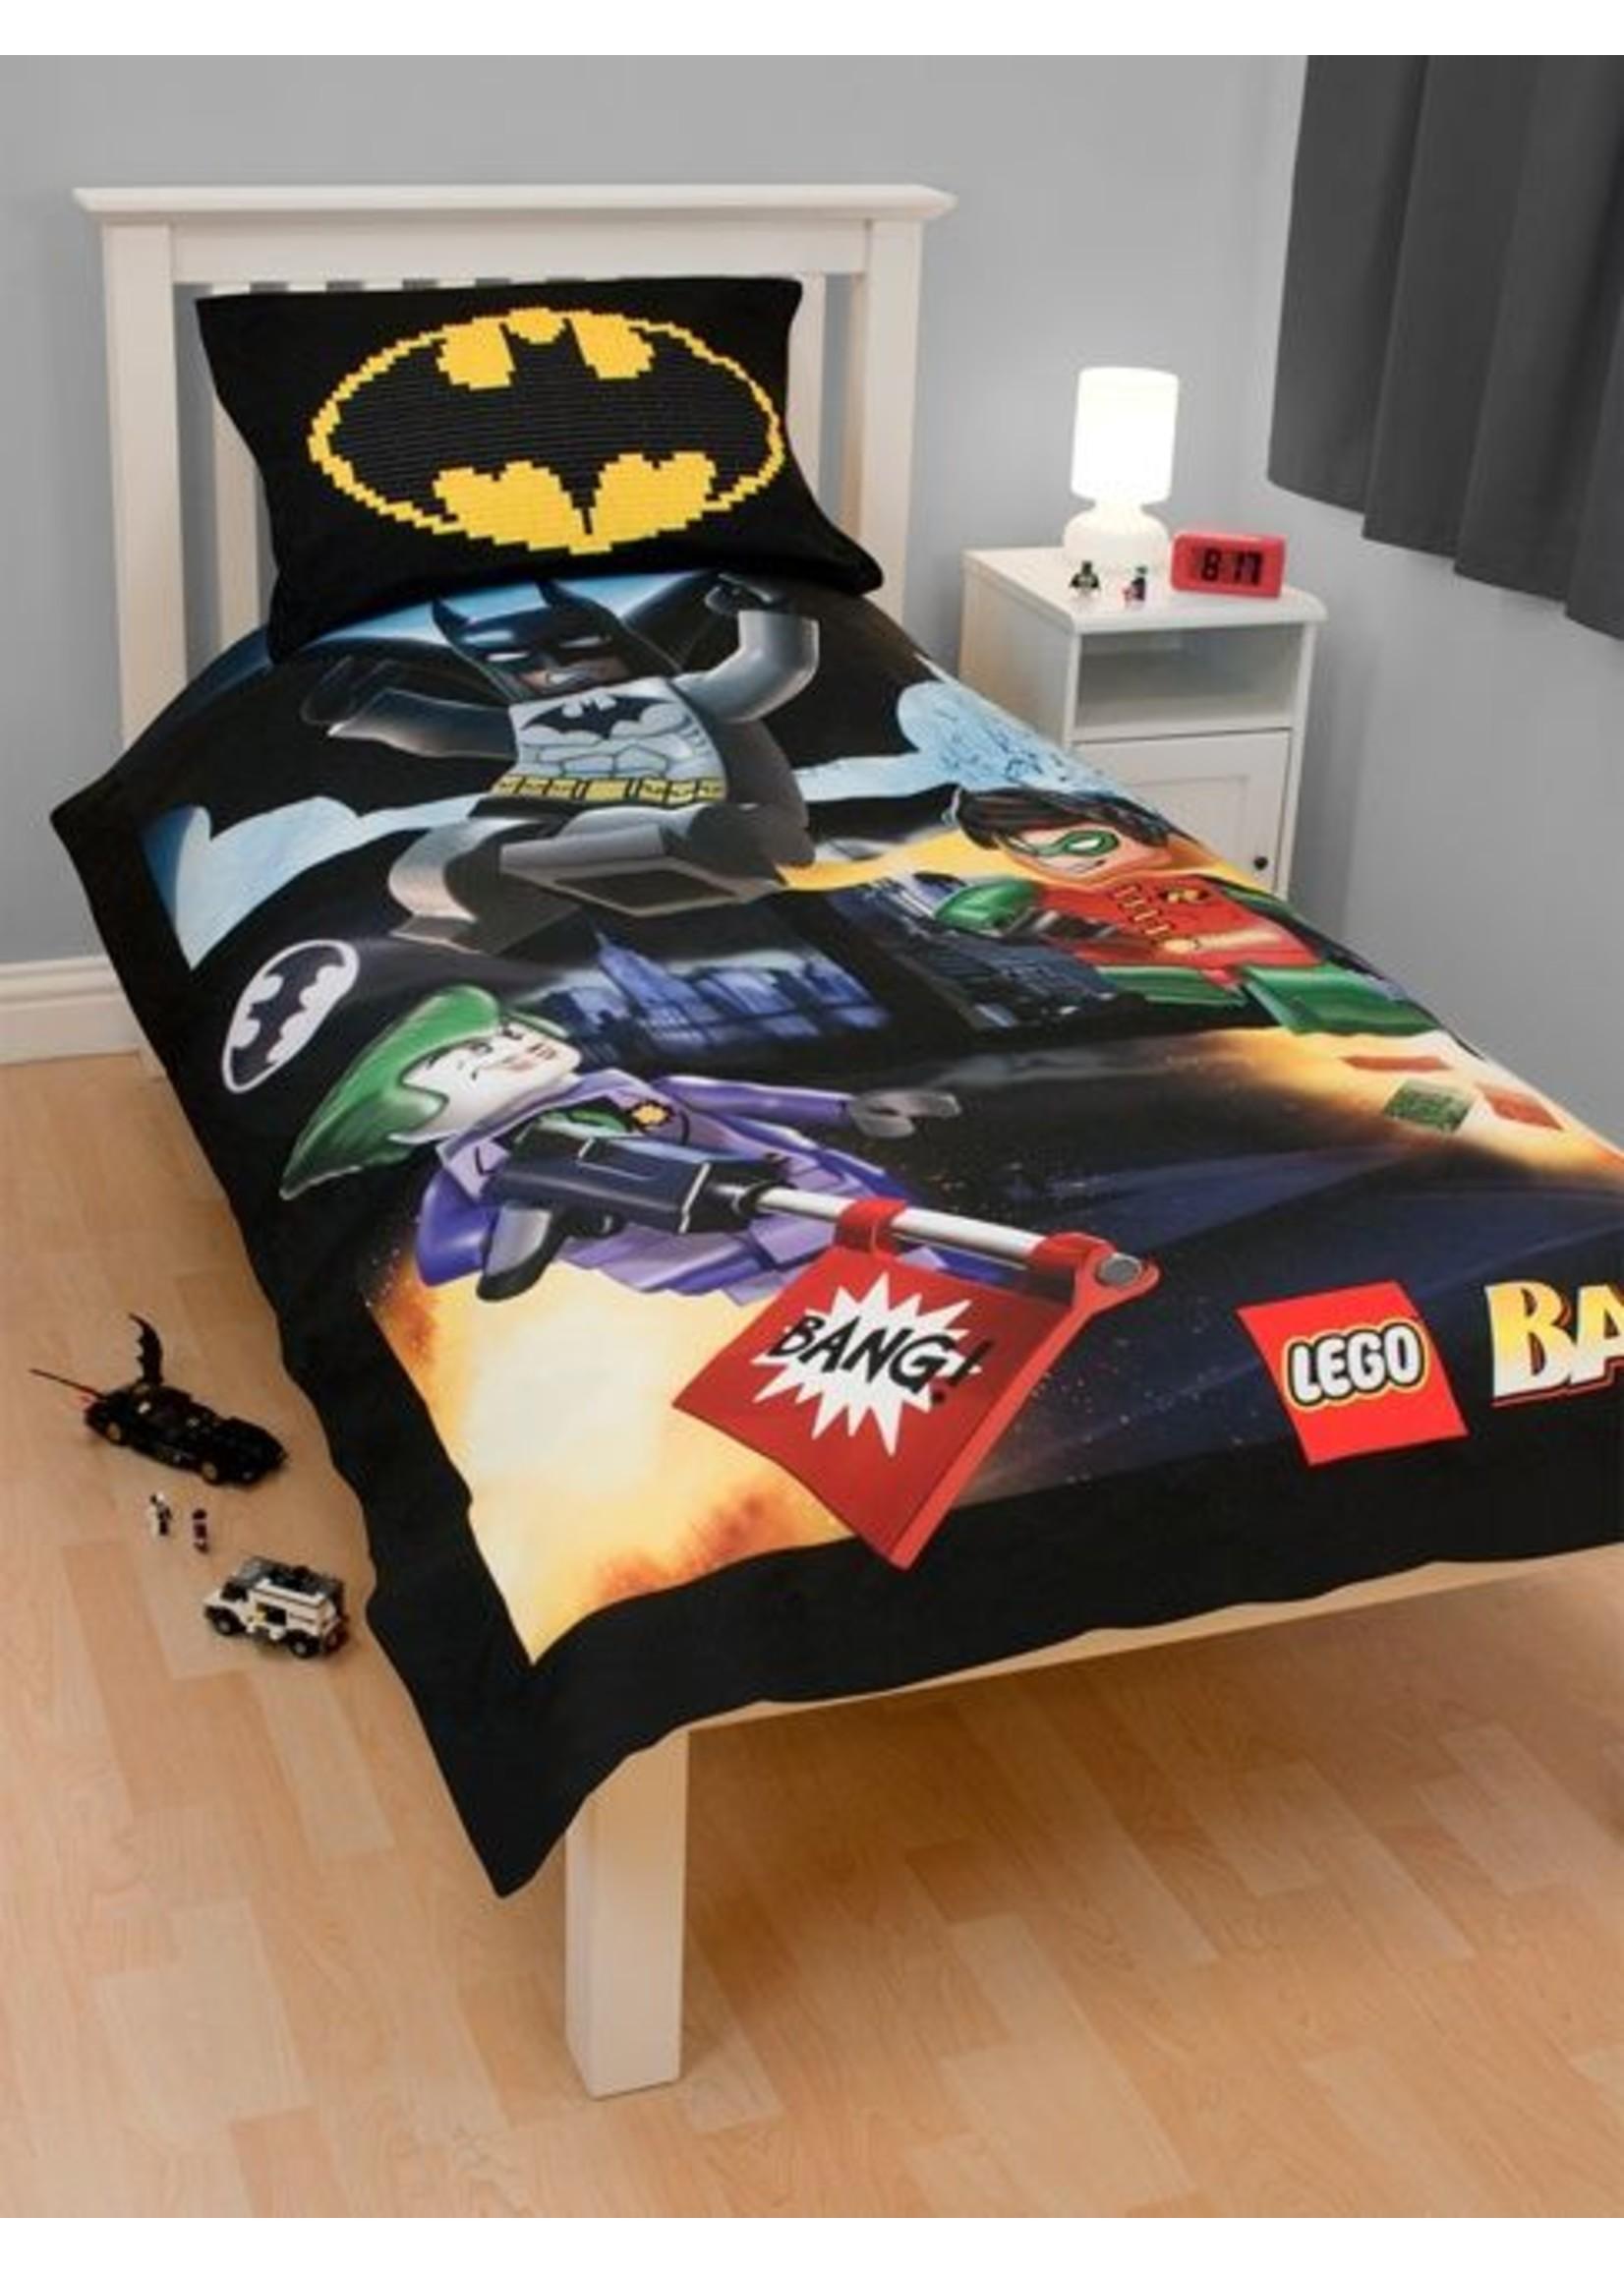 DC Comics Batman Dekbedovertrek Set Lego LEG12015